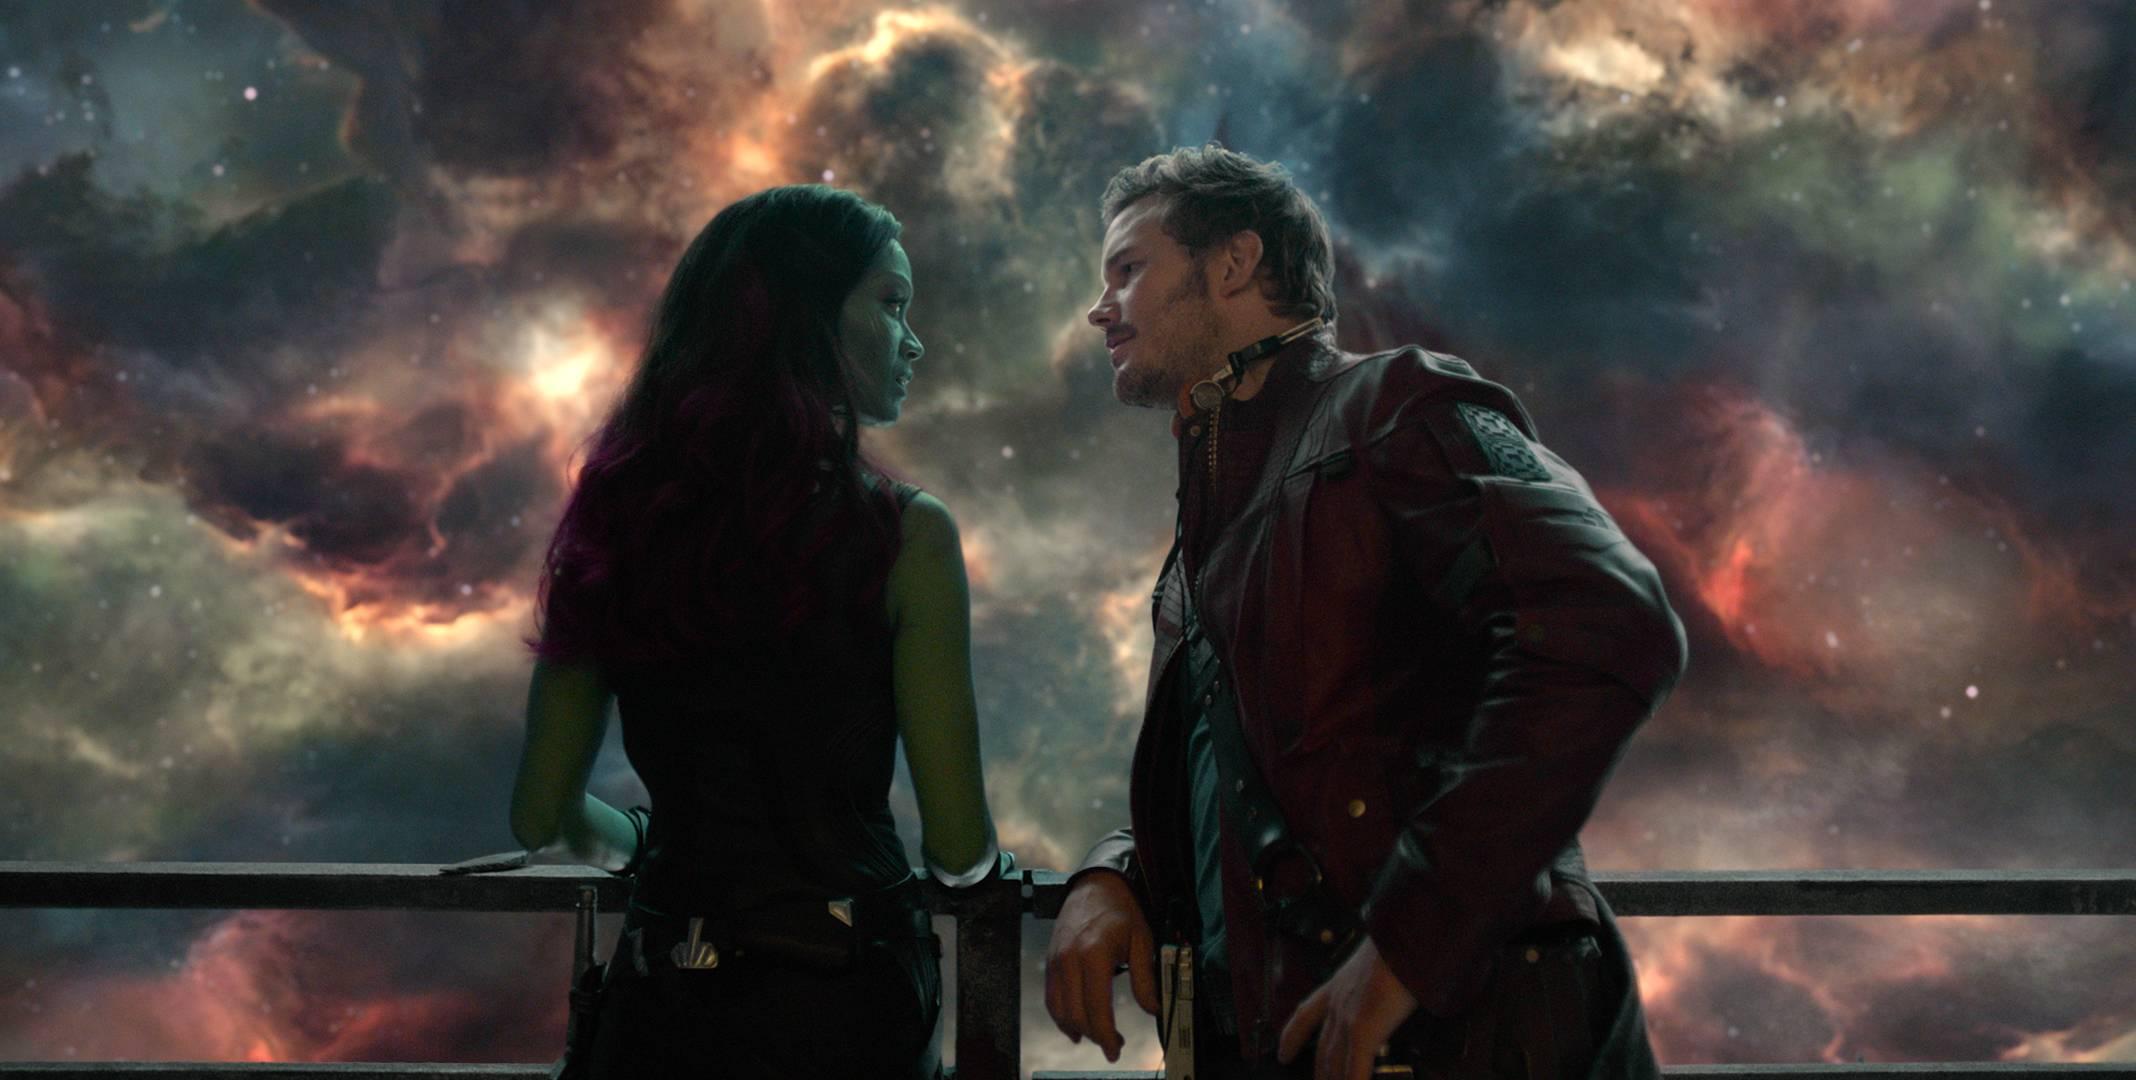 Star Lord's Star-gaze Romance with Gamora